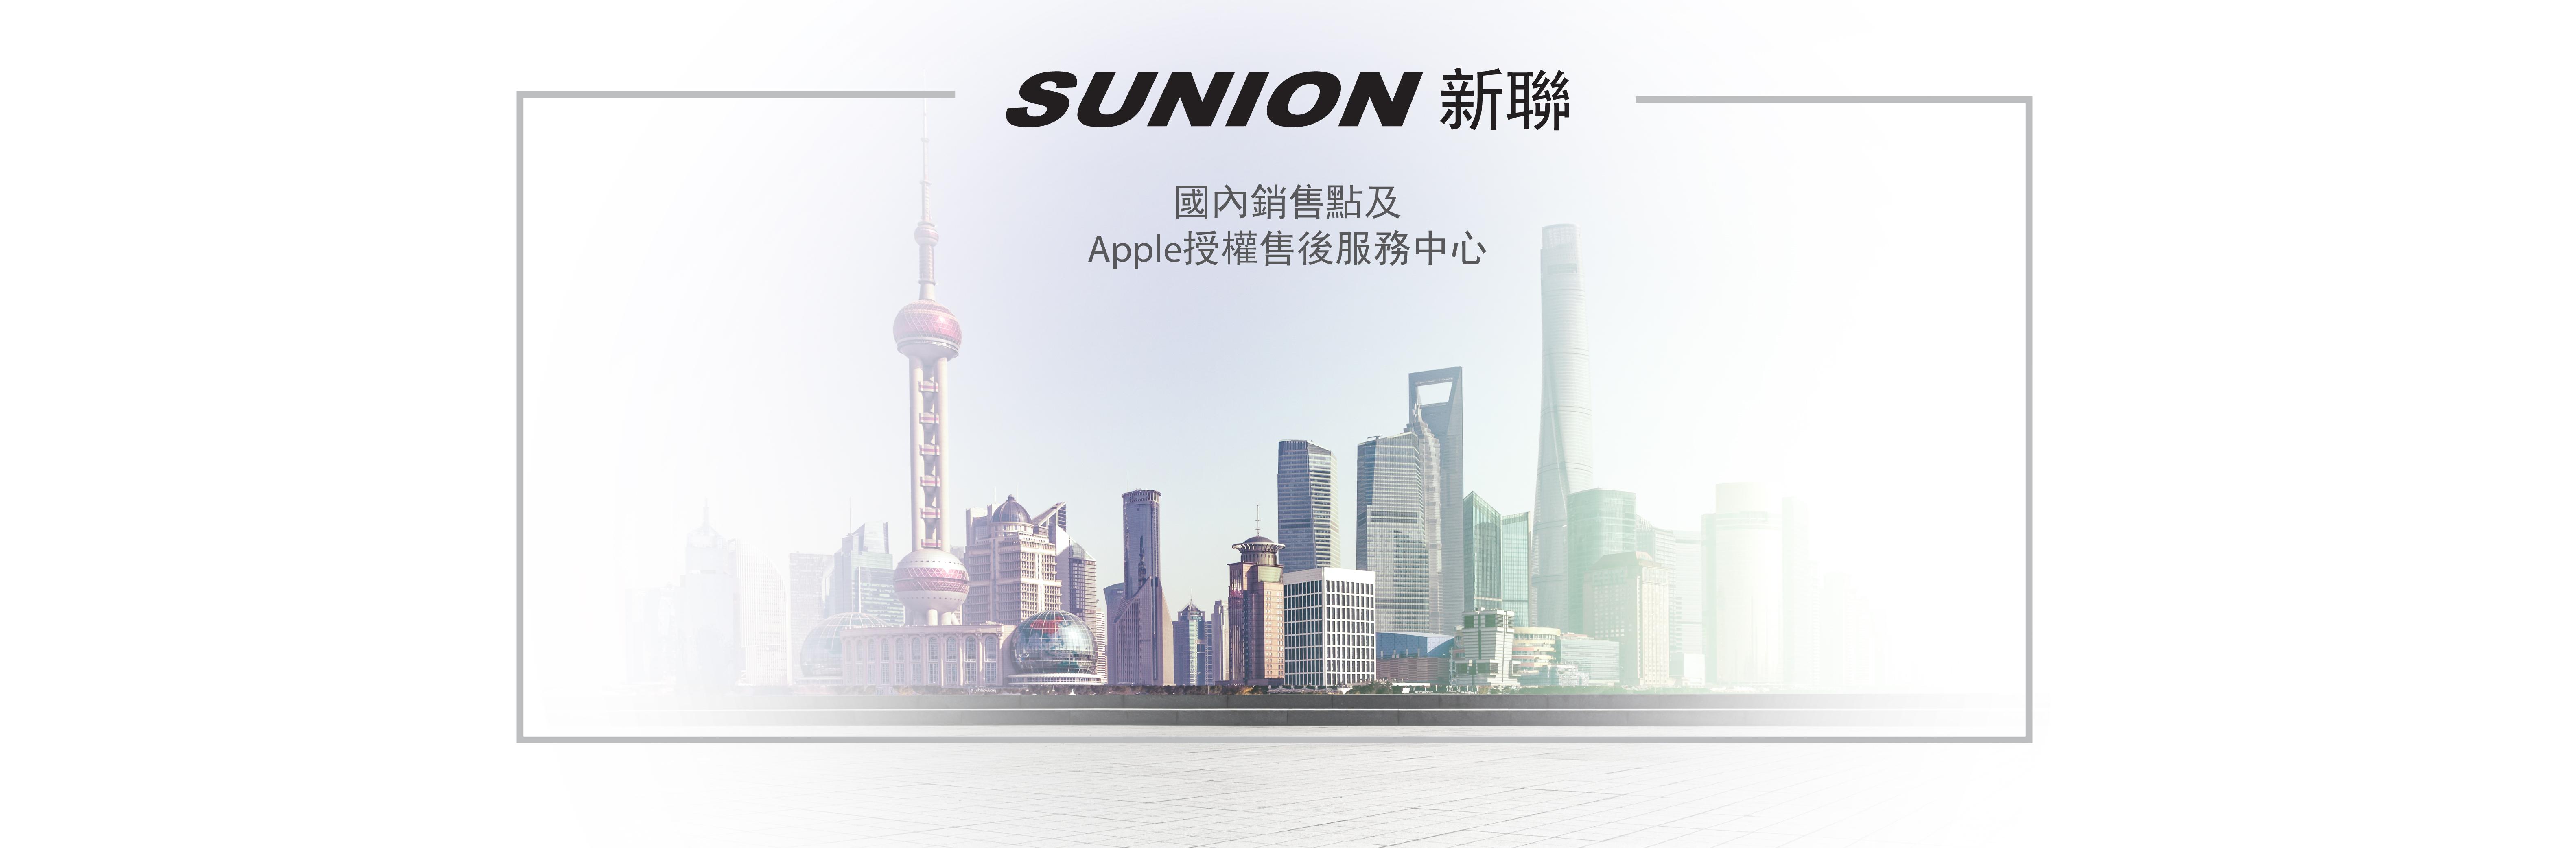 Websoite Banner China Network-01